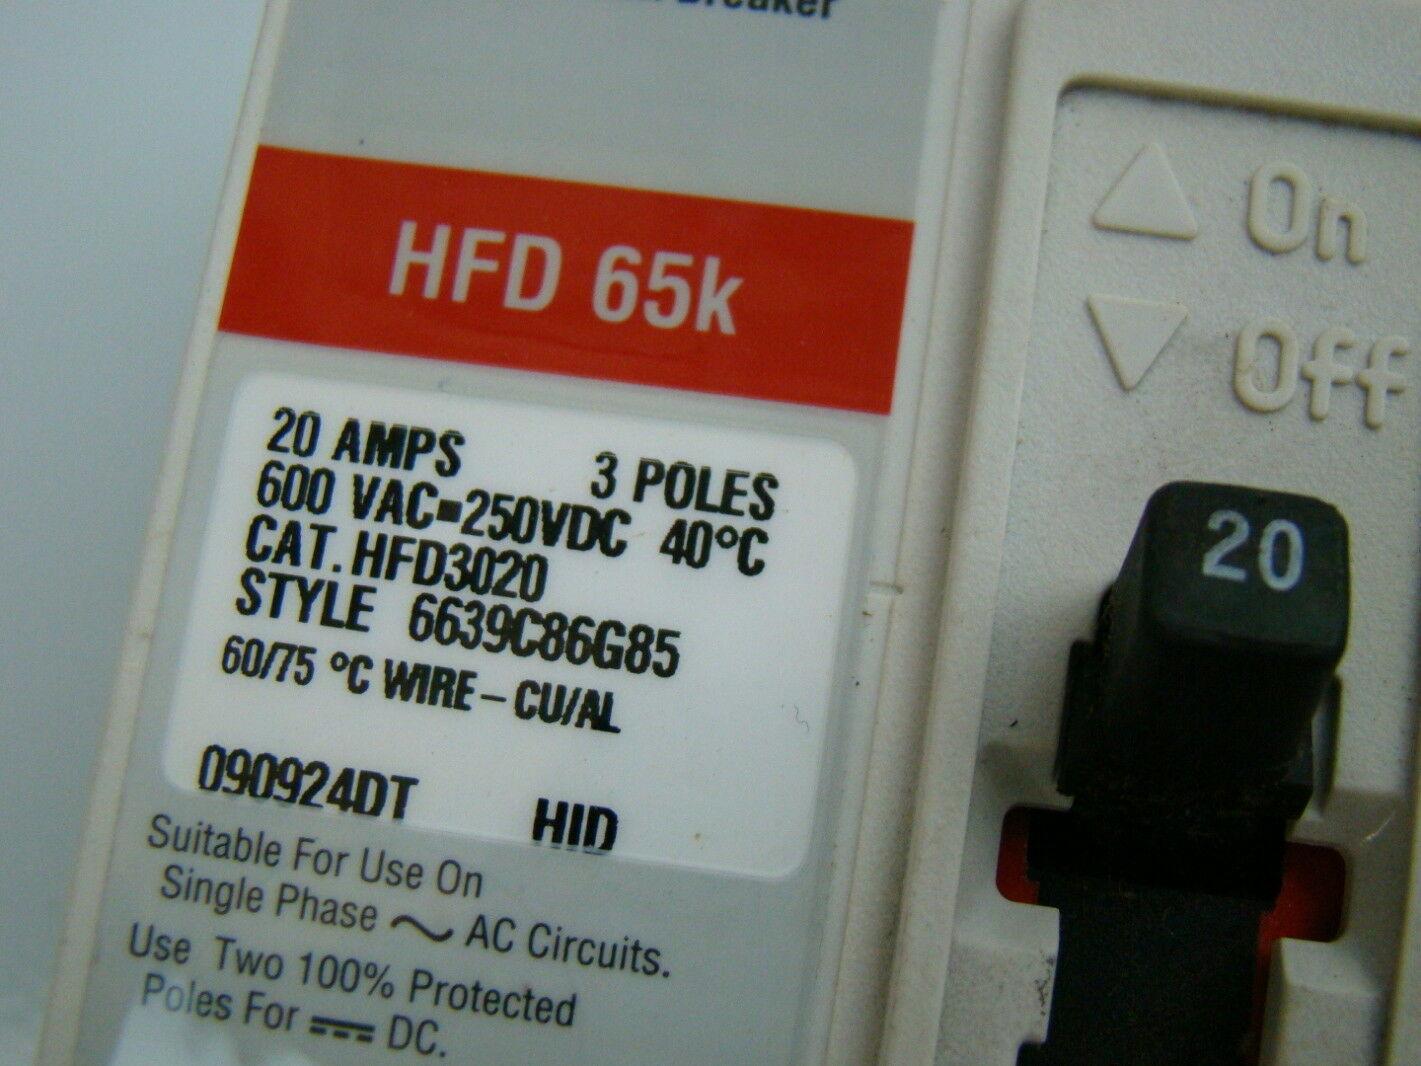 Cutler Hammer 20 Amp 600VAC Circuit Breaker HFD3020 | Joseph Fazzio ...